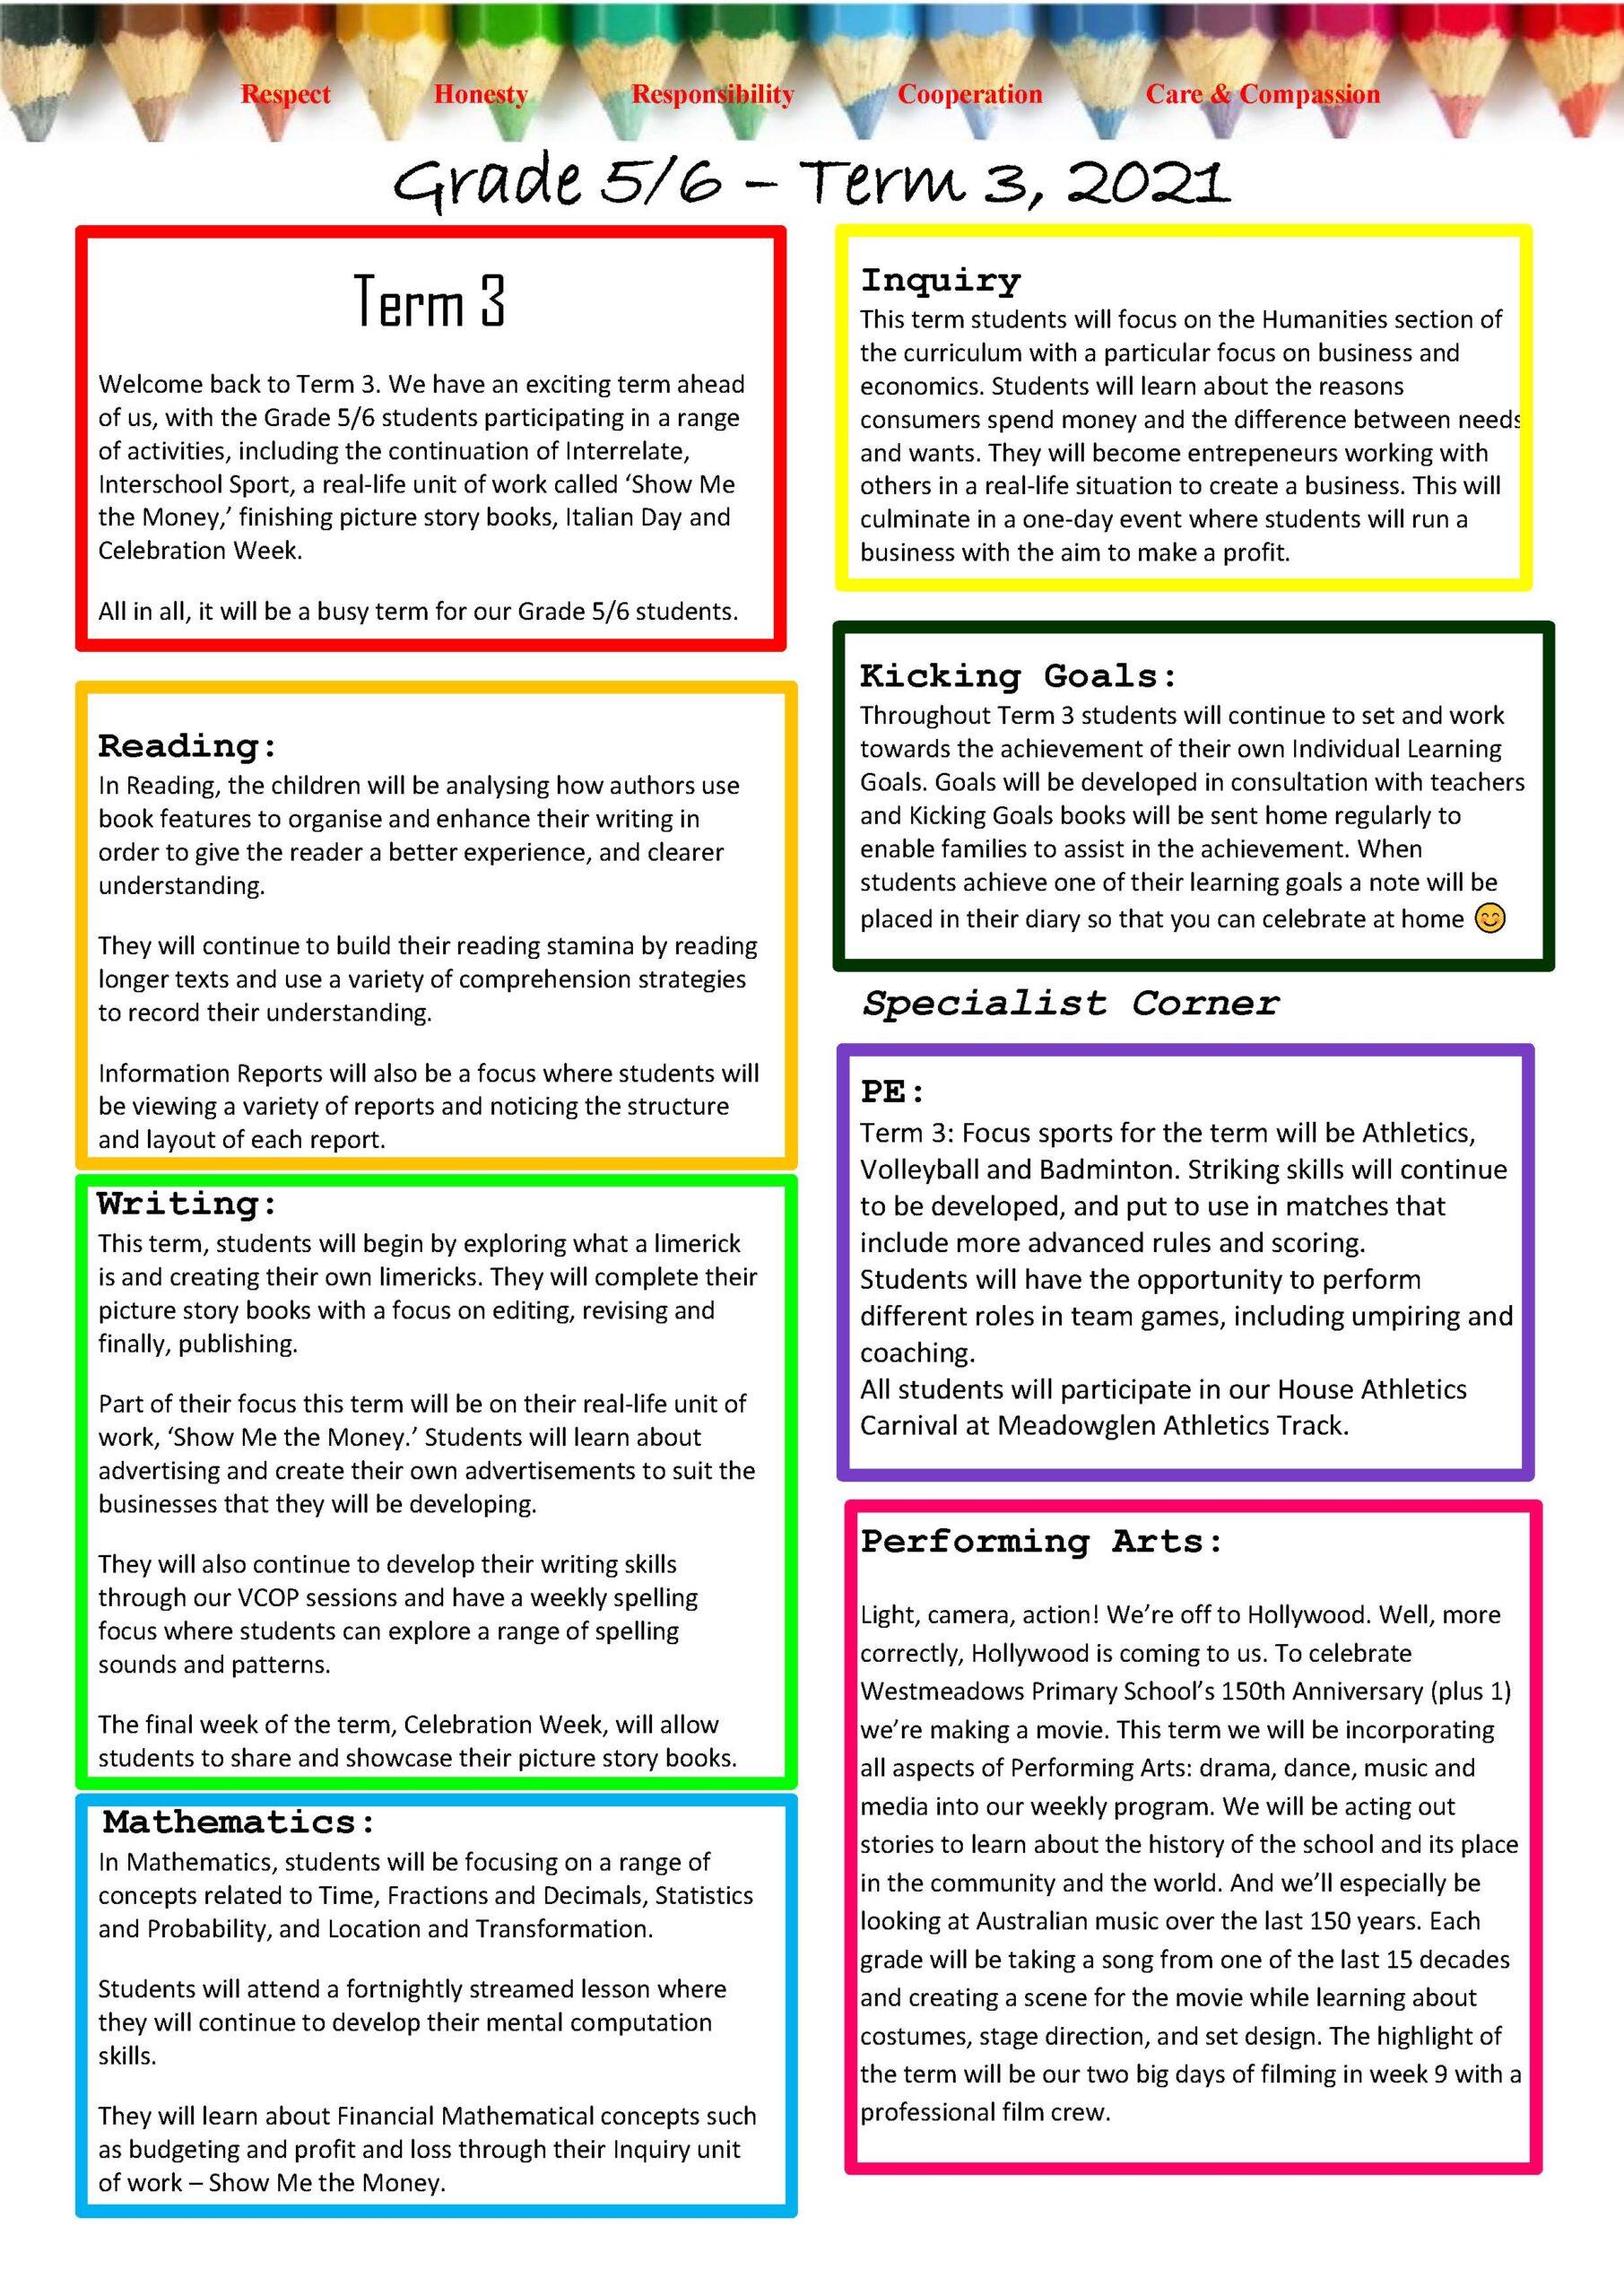 Grade 5/6 Term 3, 2021 Newsletter